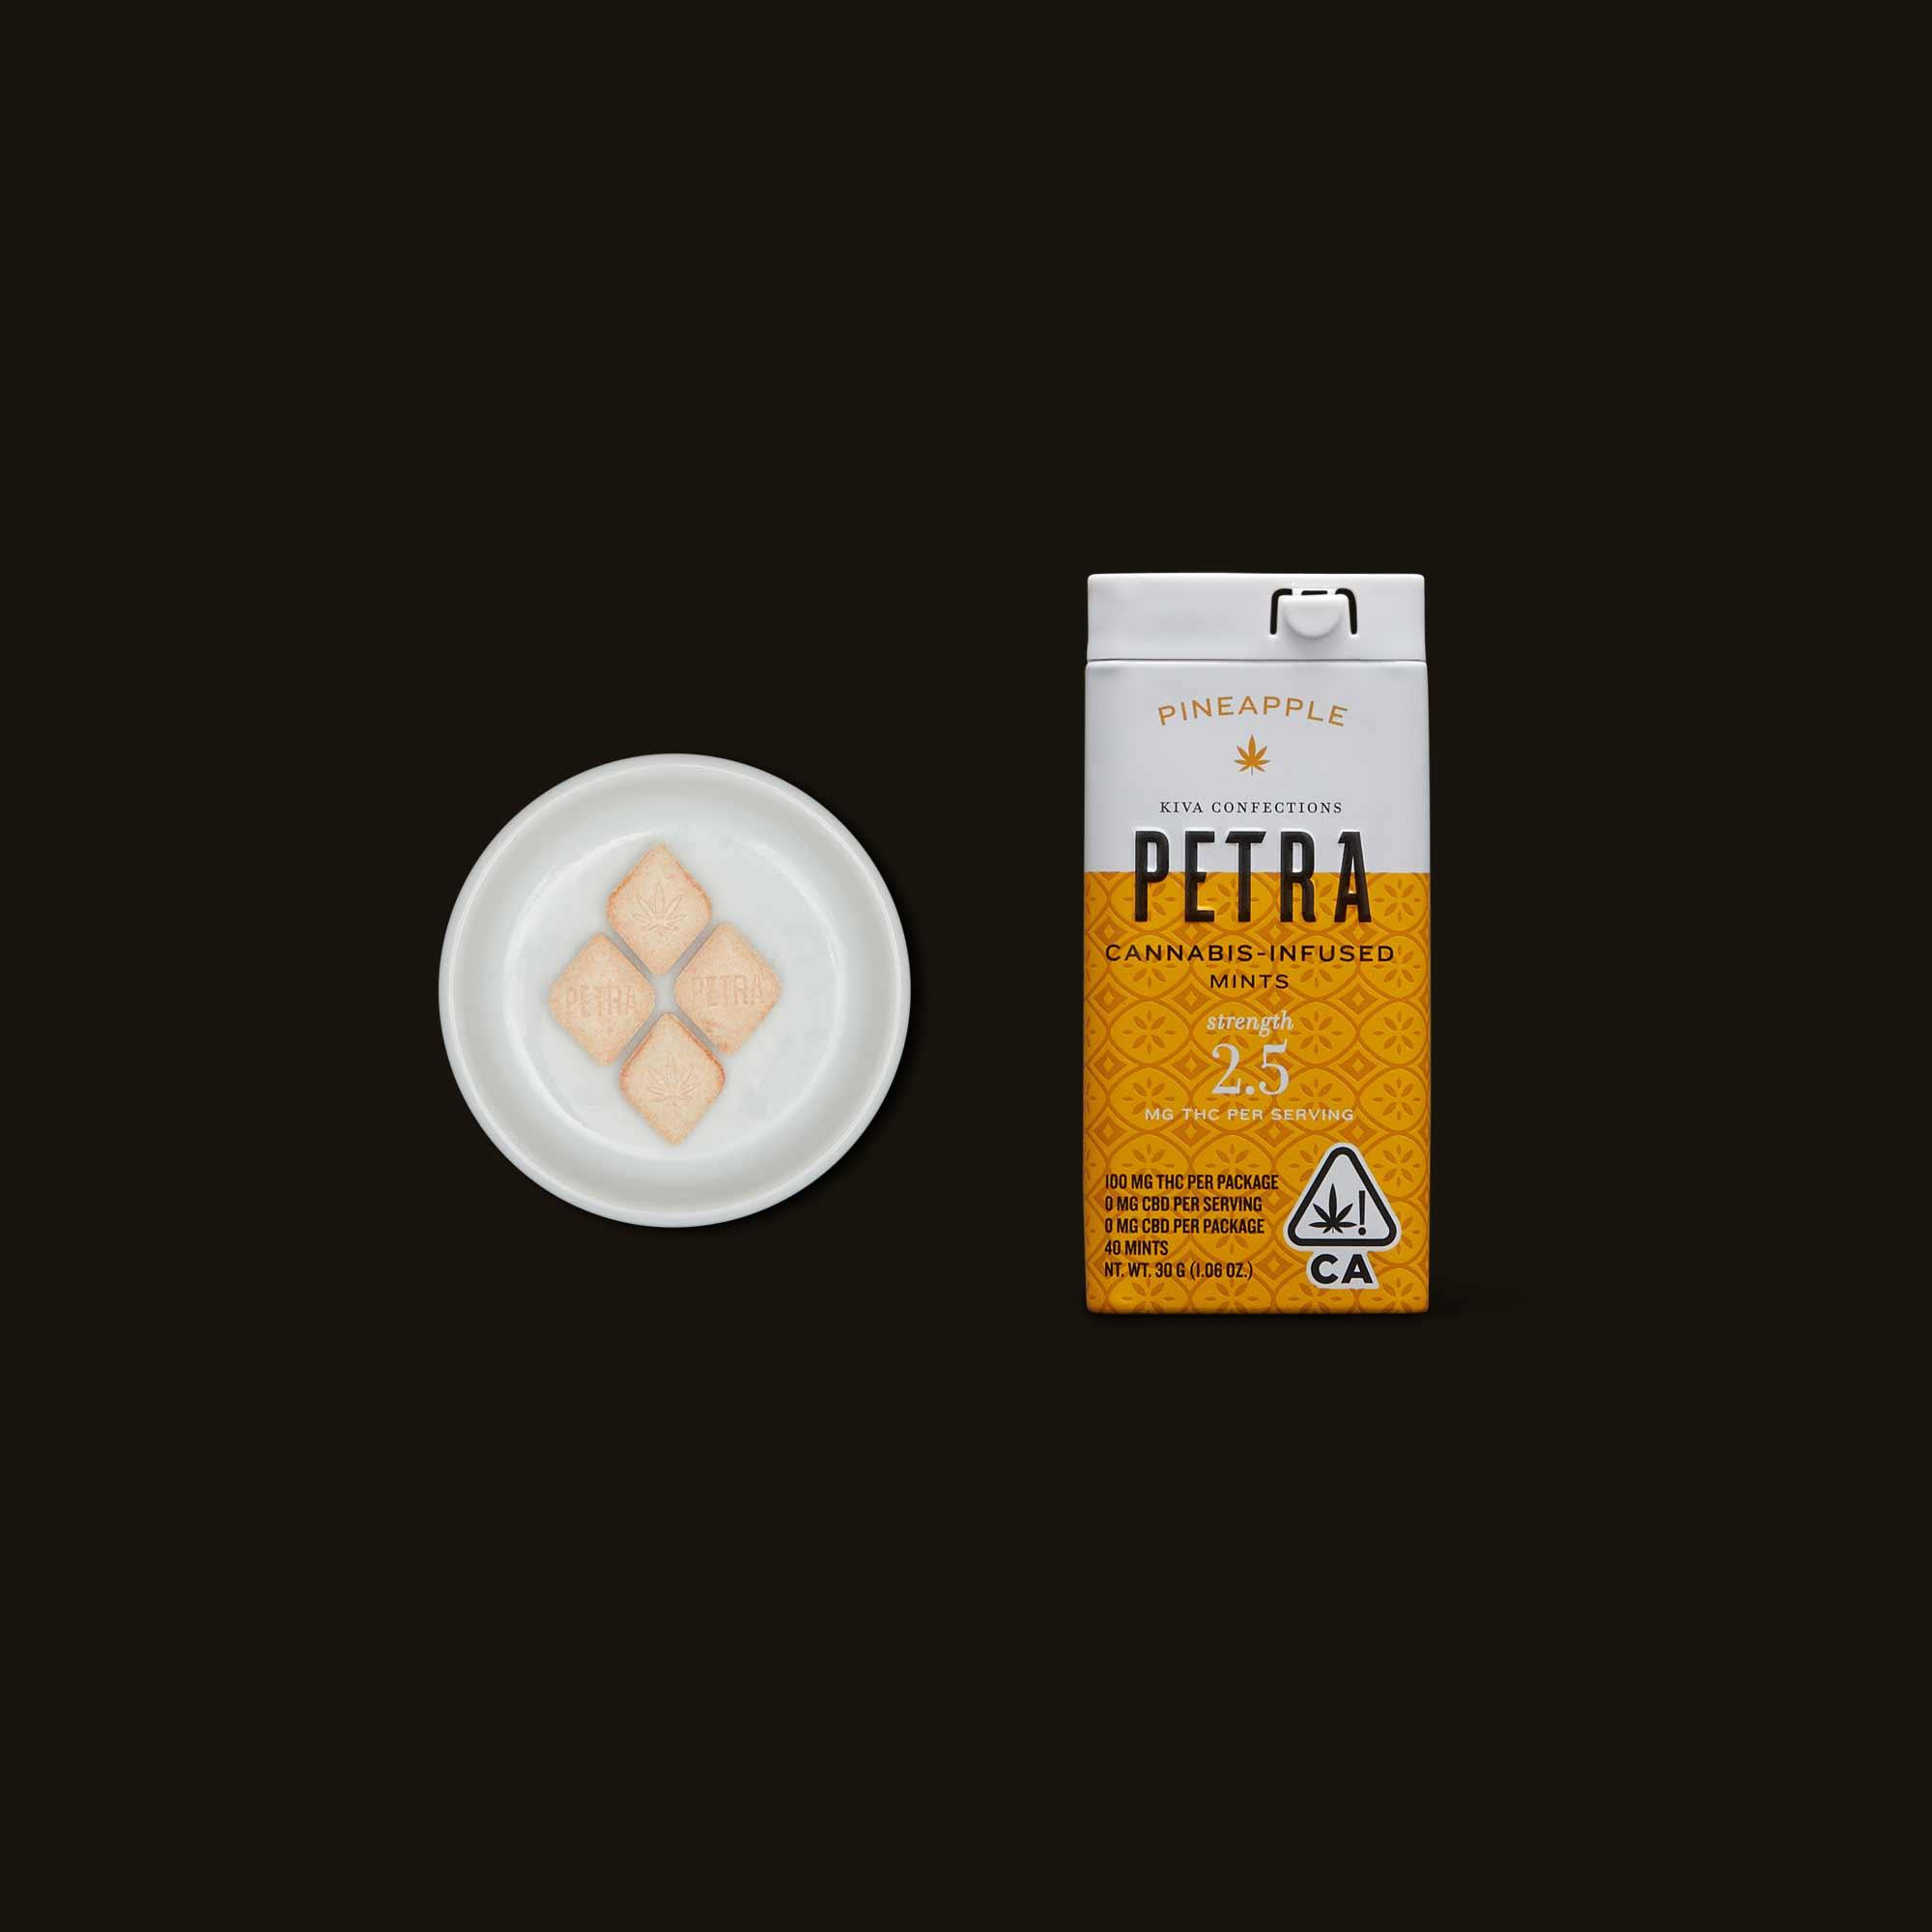 Kiva Confections Petra Pineapple Mints